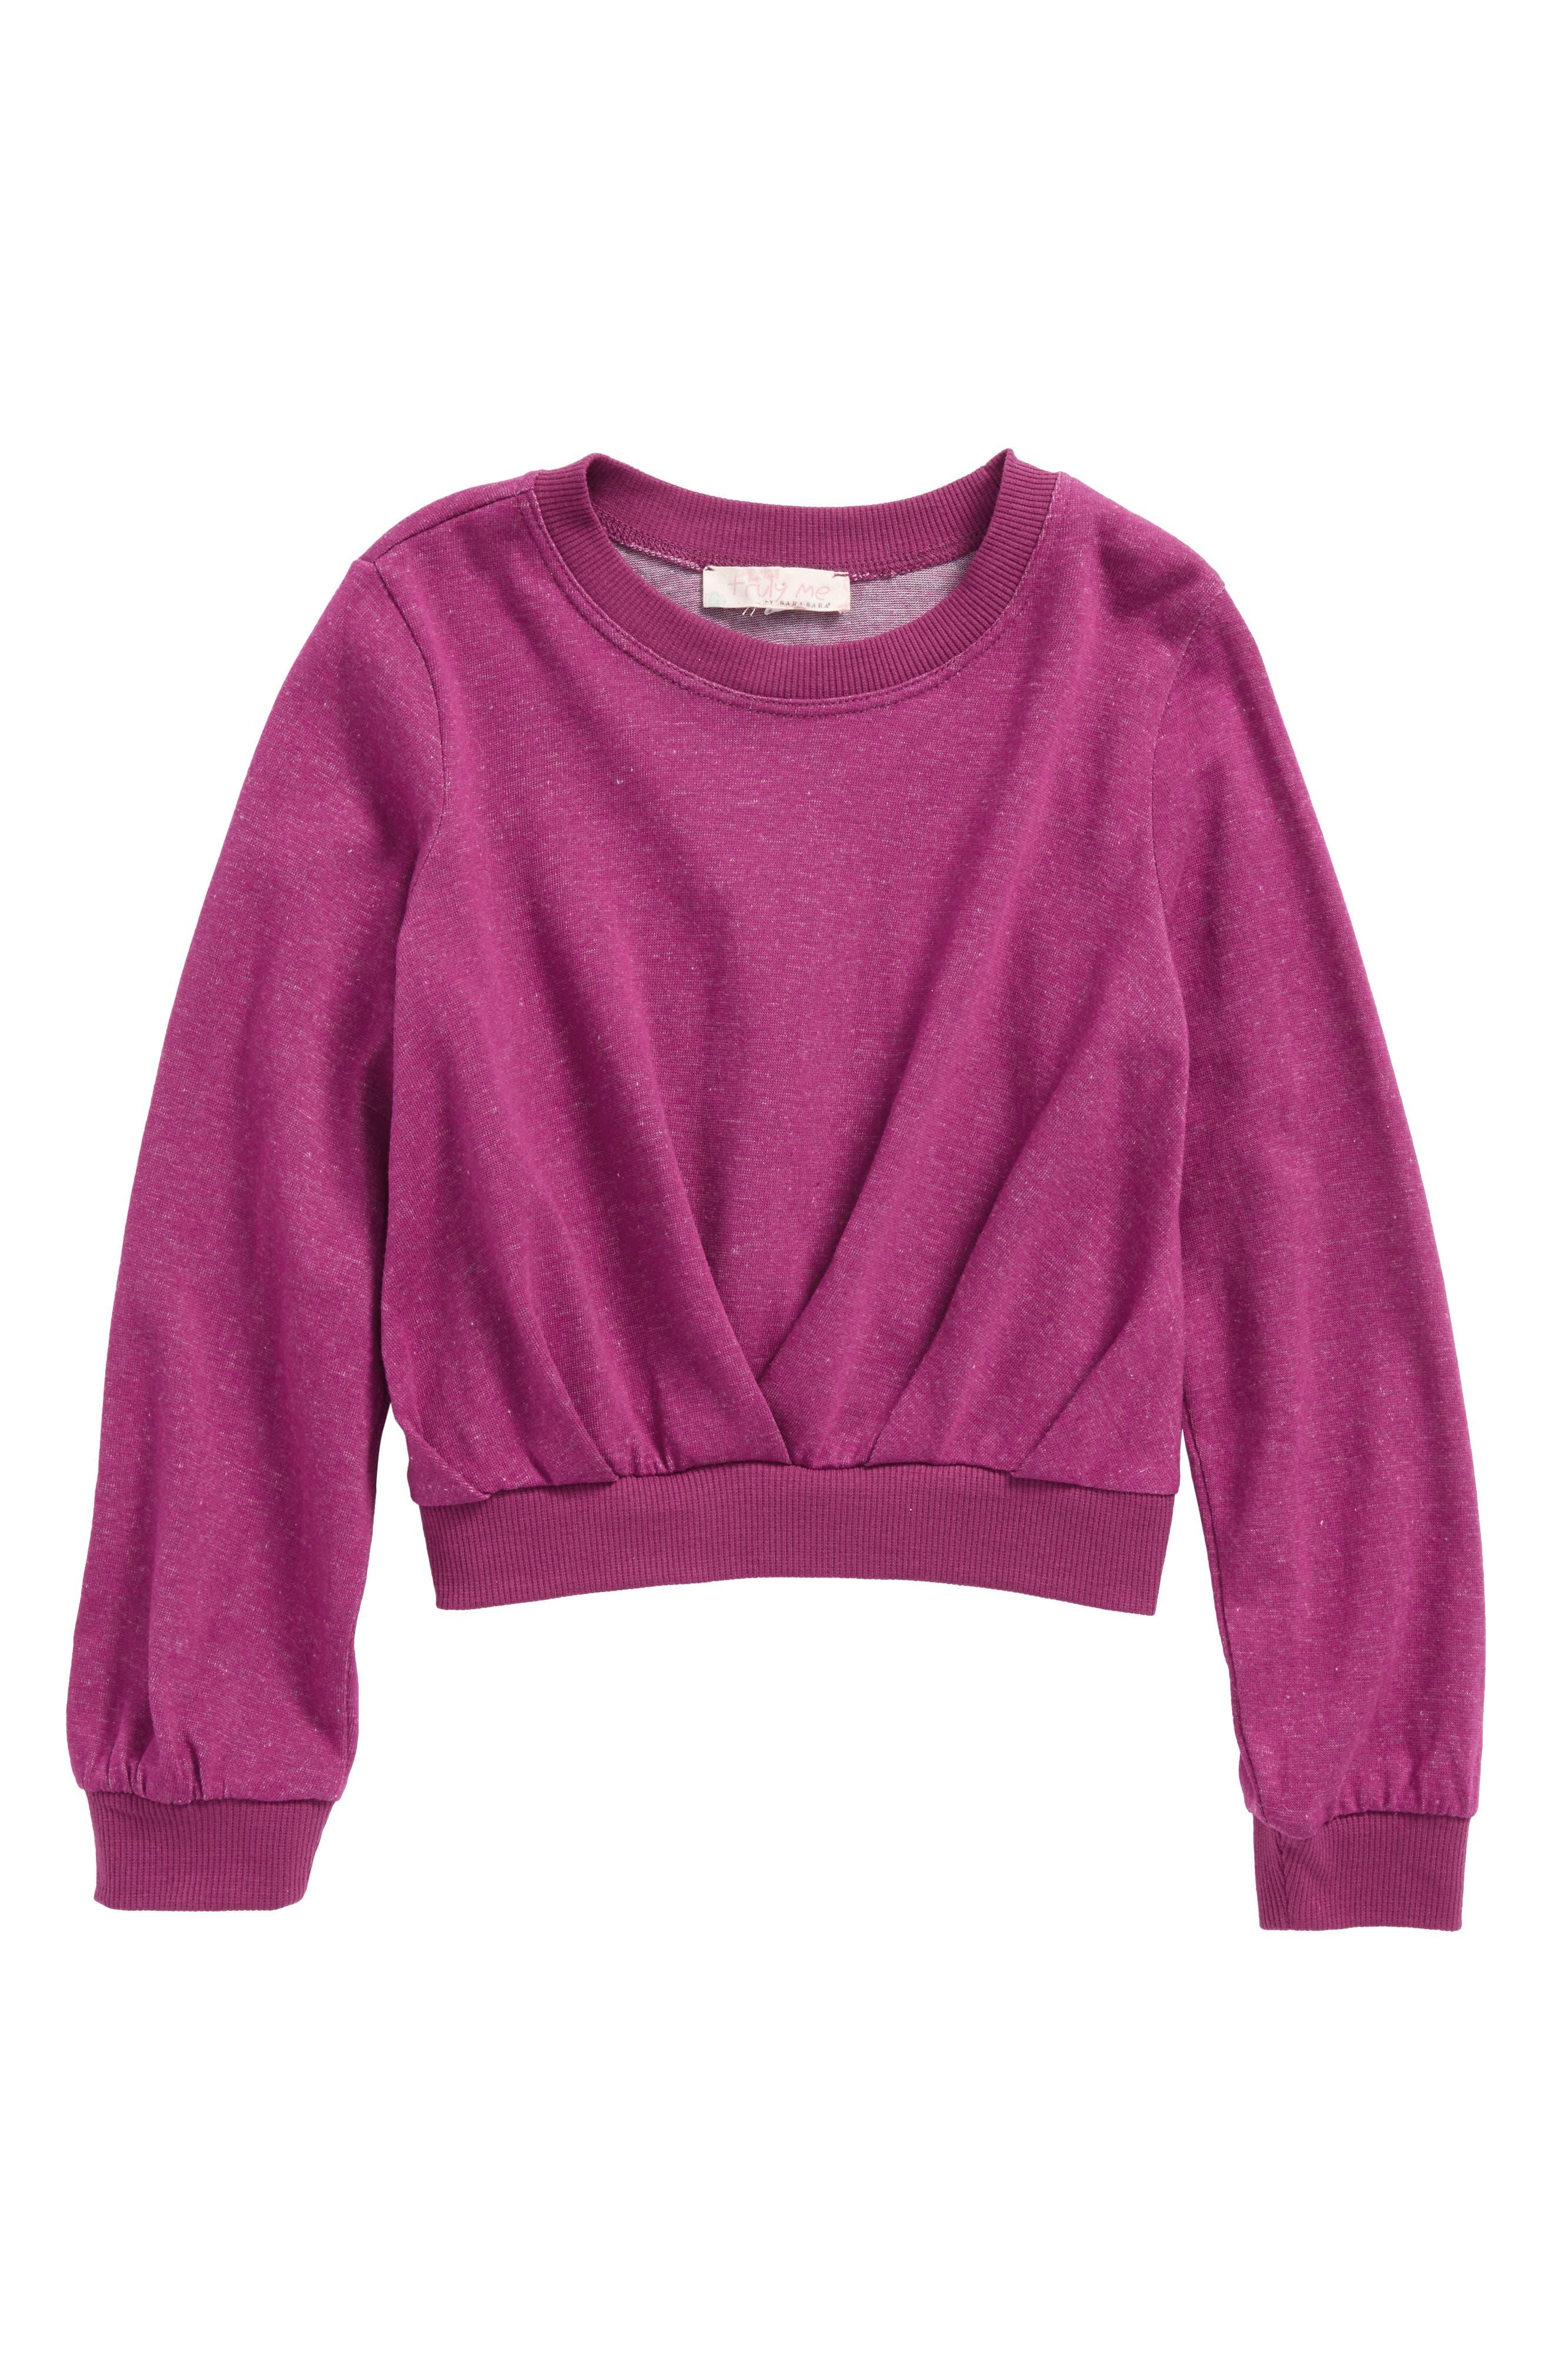 Main Image - Truly Me Pleated Sweatshirt (Toddler Girls & Little Girls)